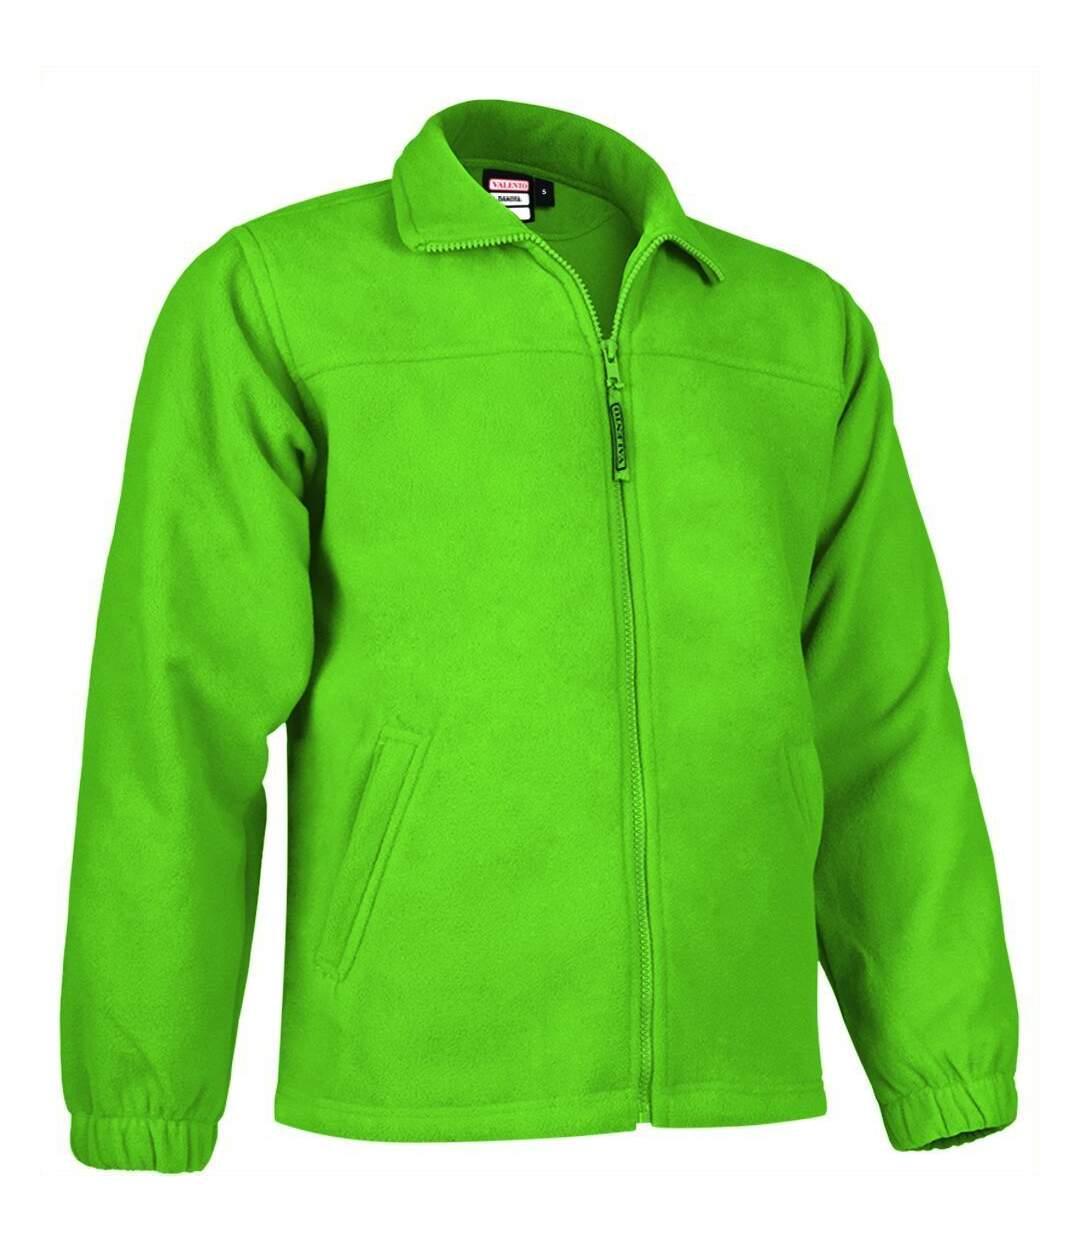 Veste polaire zippée - Homme - REF DAKOTA - vert lime